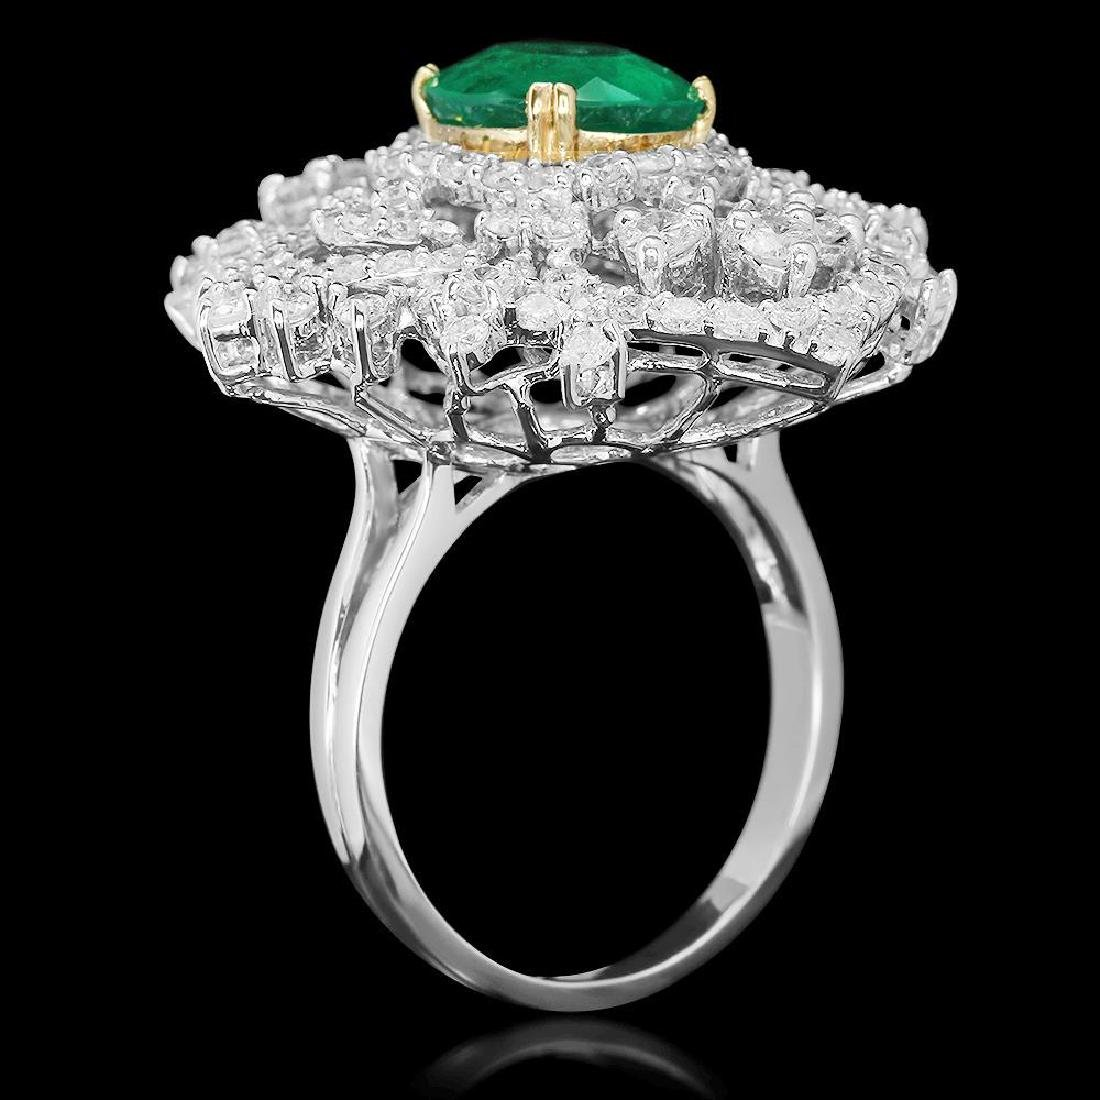 18K Gold 3.11 Emerald 3.22 Diamond Ring - 2